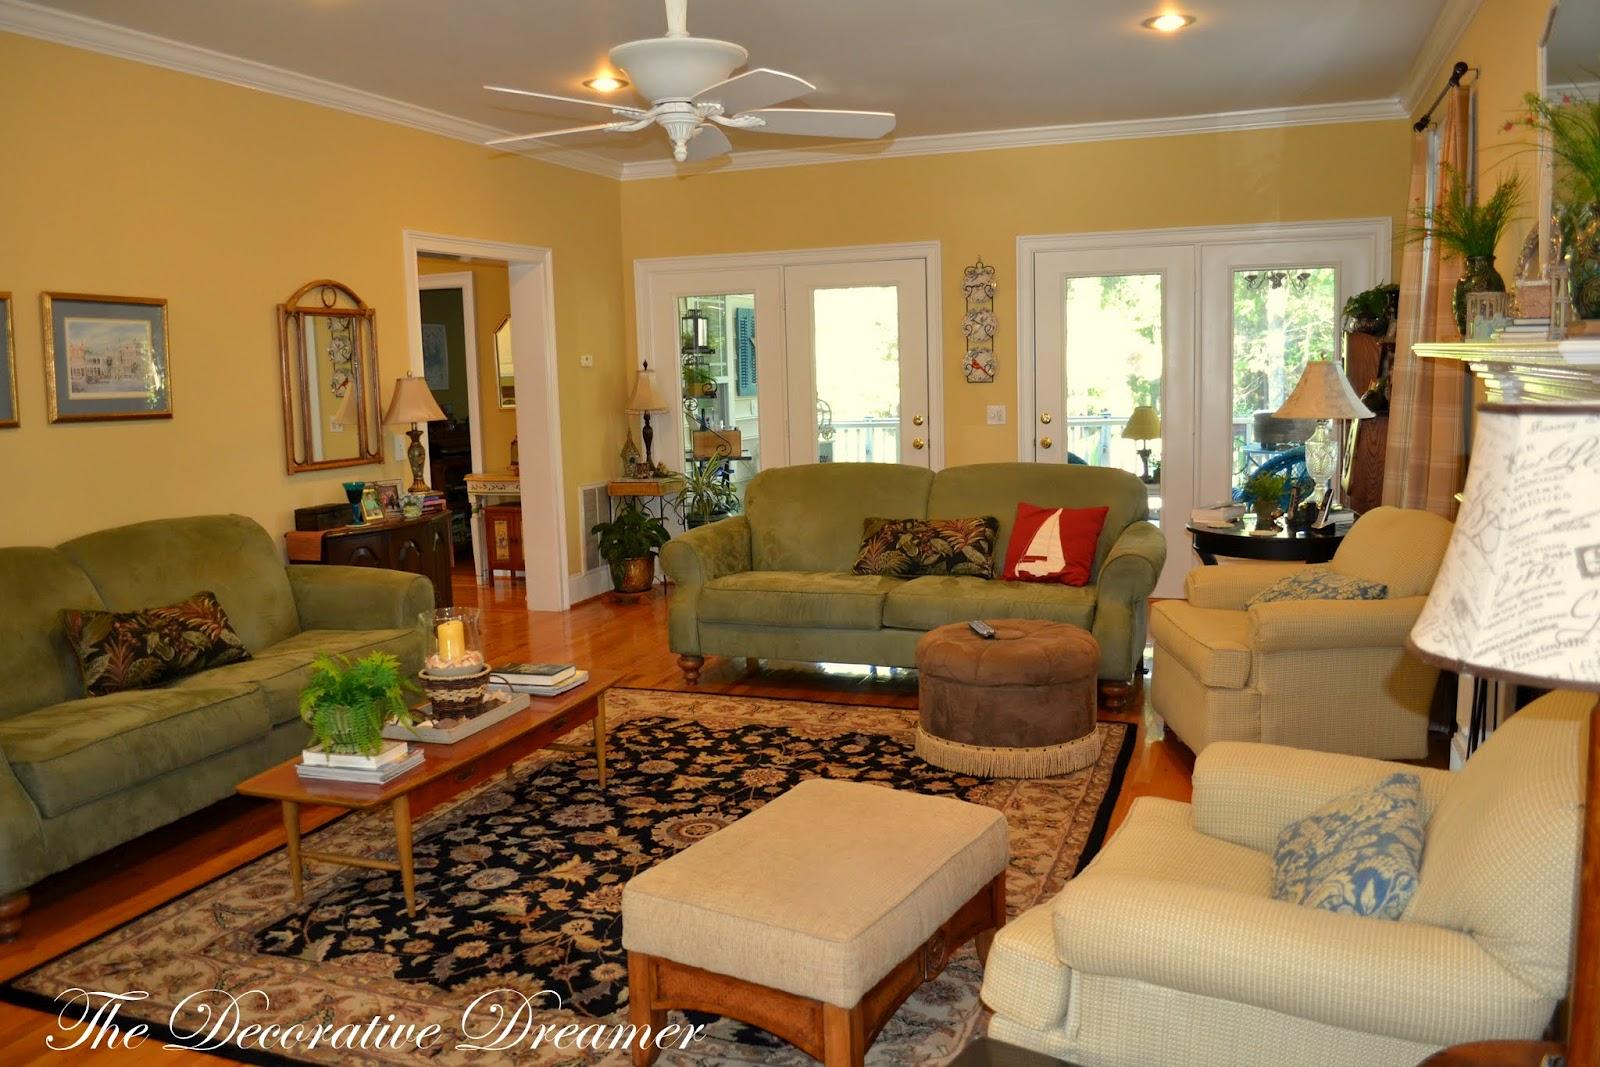 The Decorative Dreamer Summer Living Room